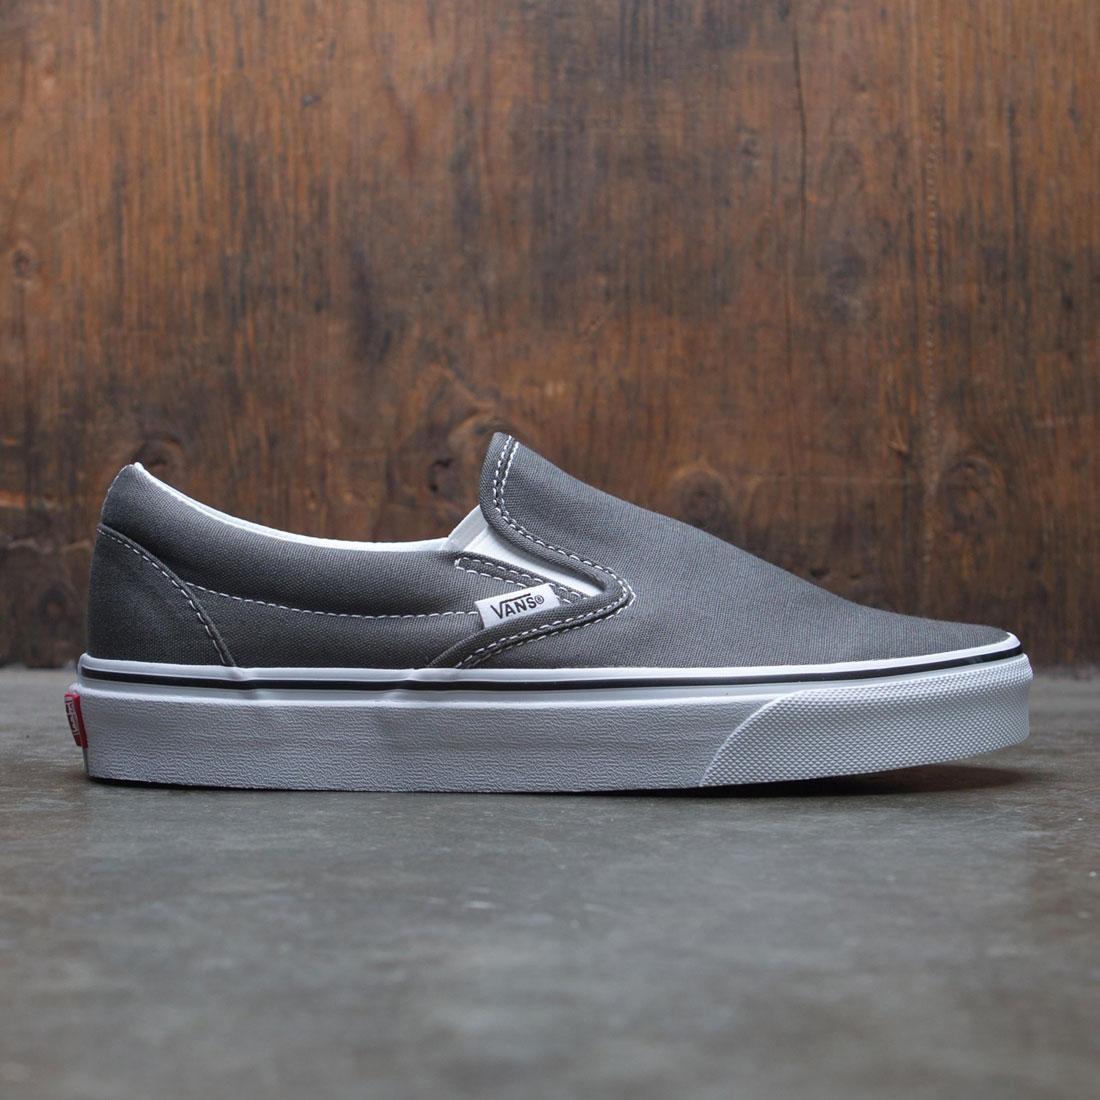 Vans Men Classic Slip-On gray charcoal